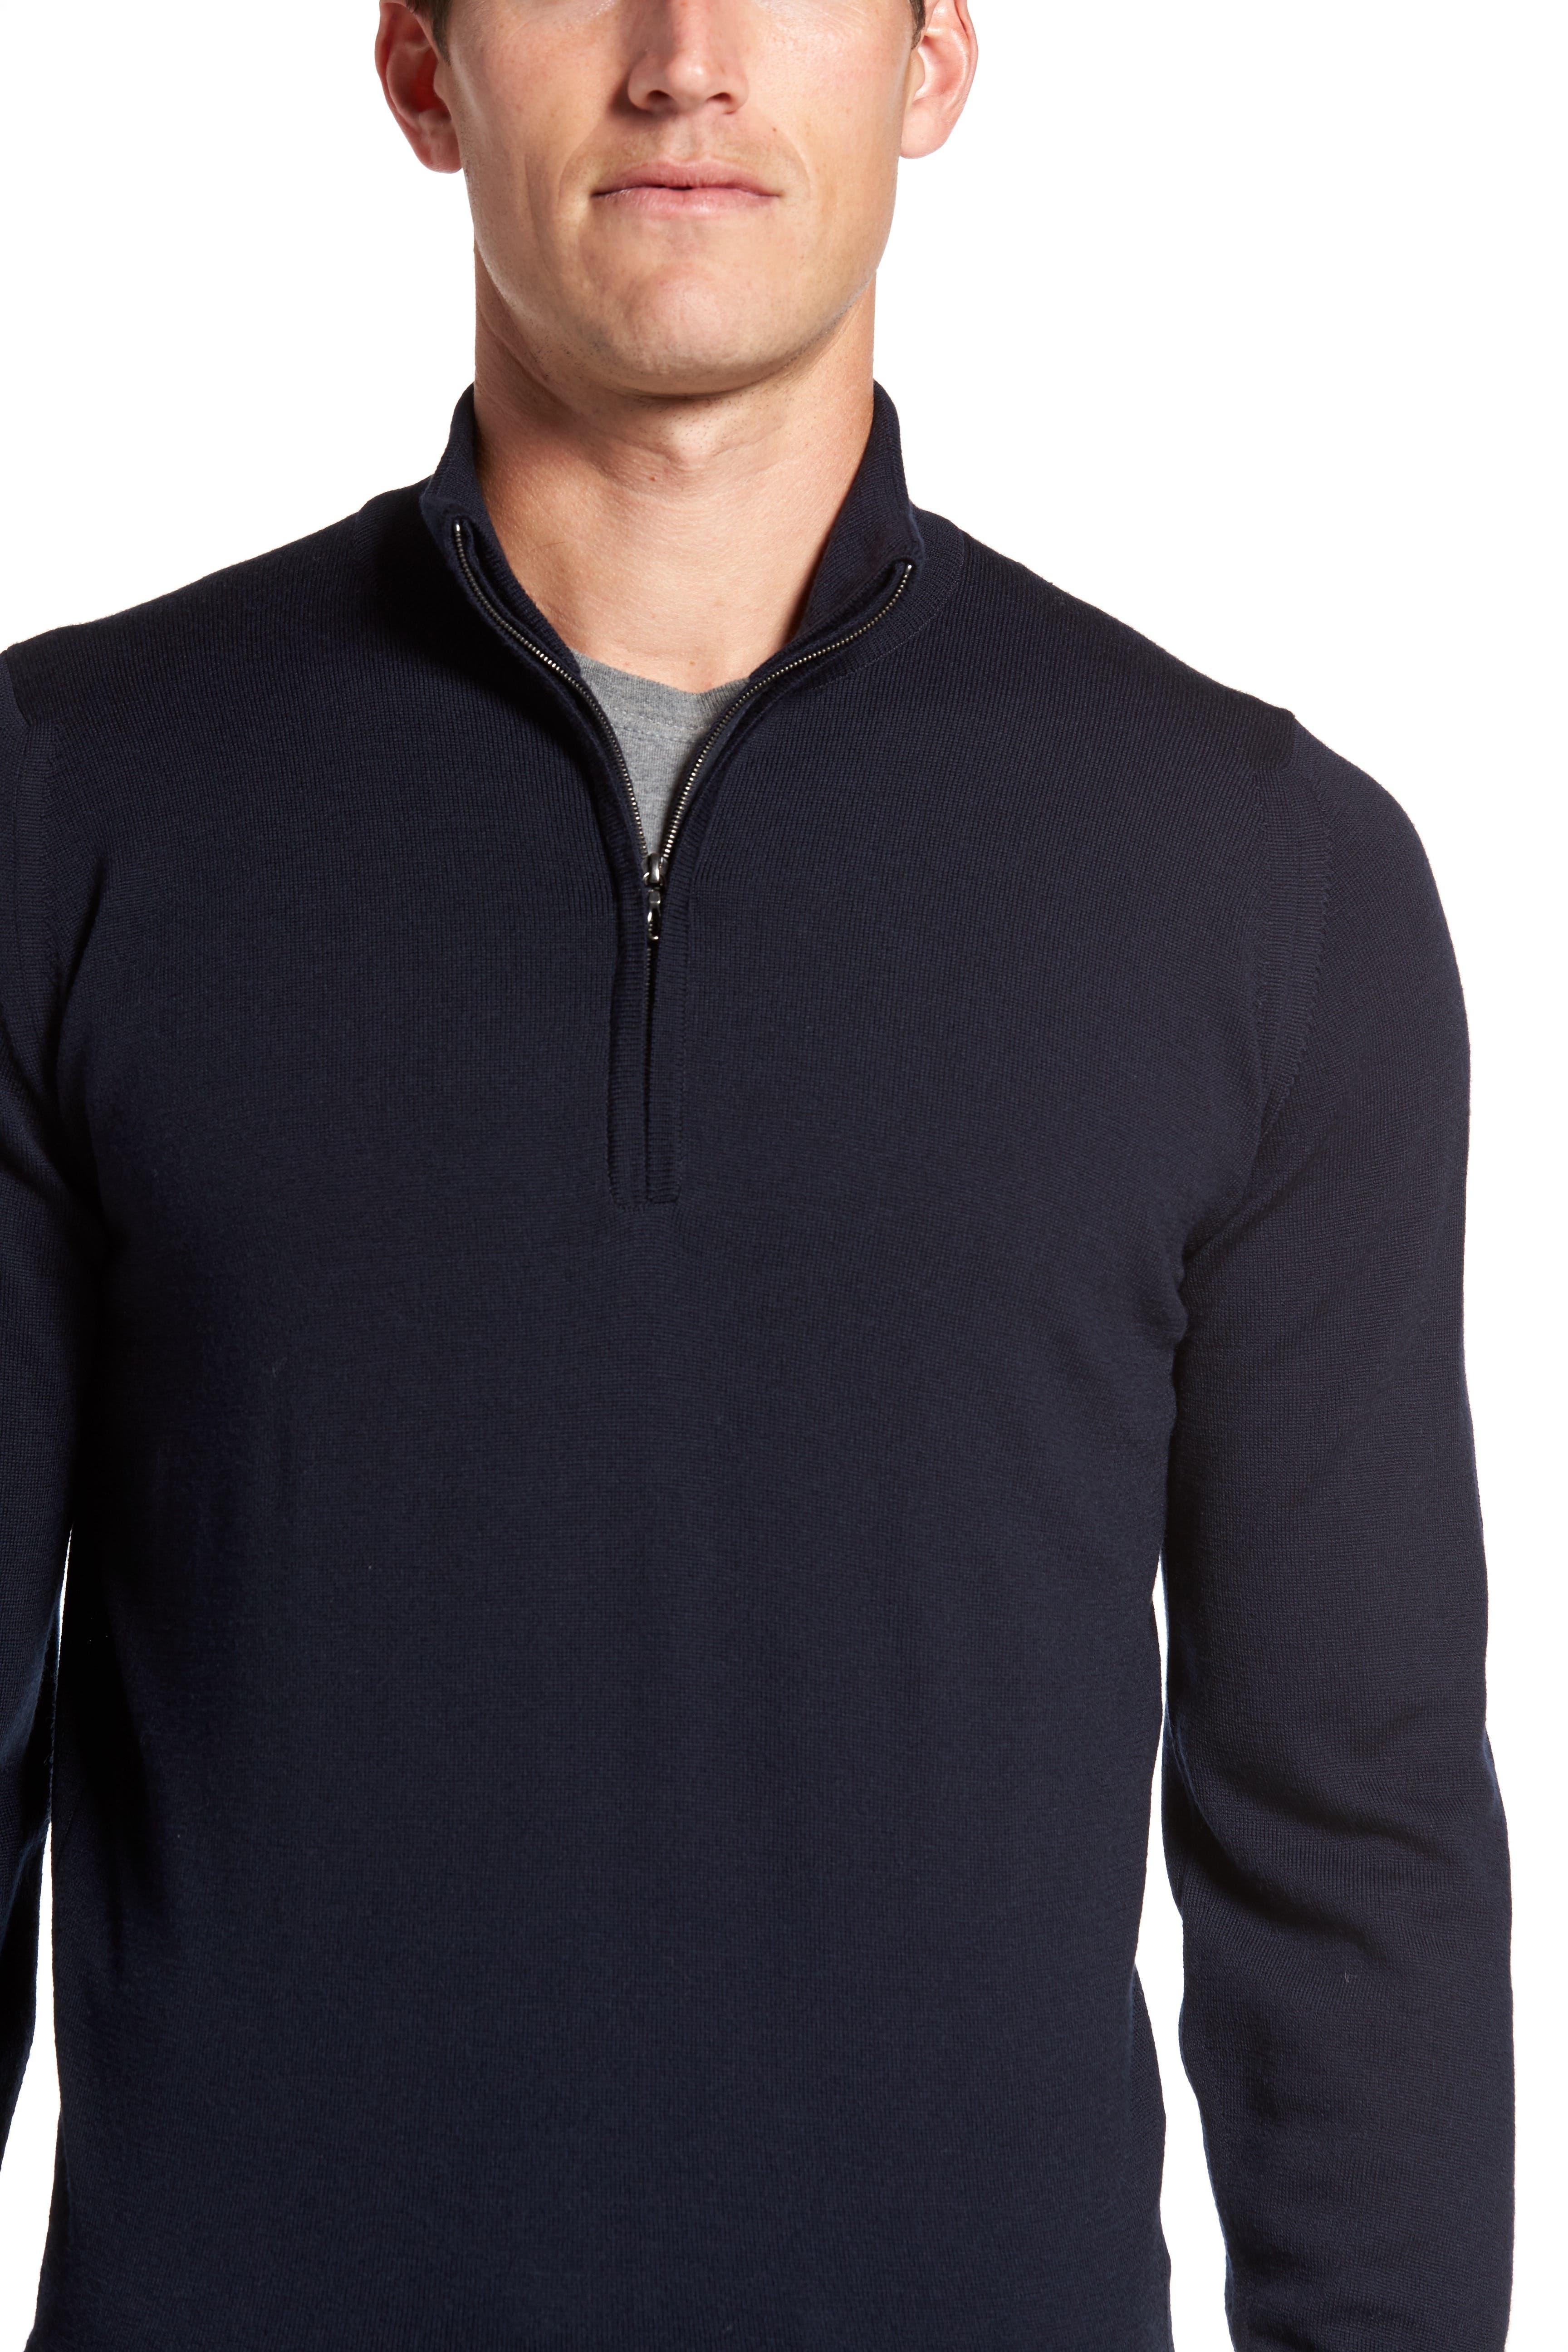 'Tapton' Quarter Zip Merino Wool Sweater,                             Alternate thumbnail 3, color,                             412